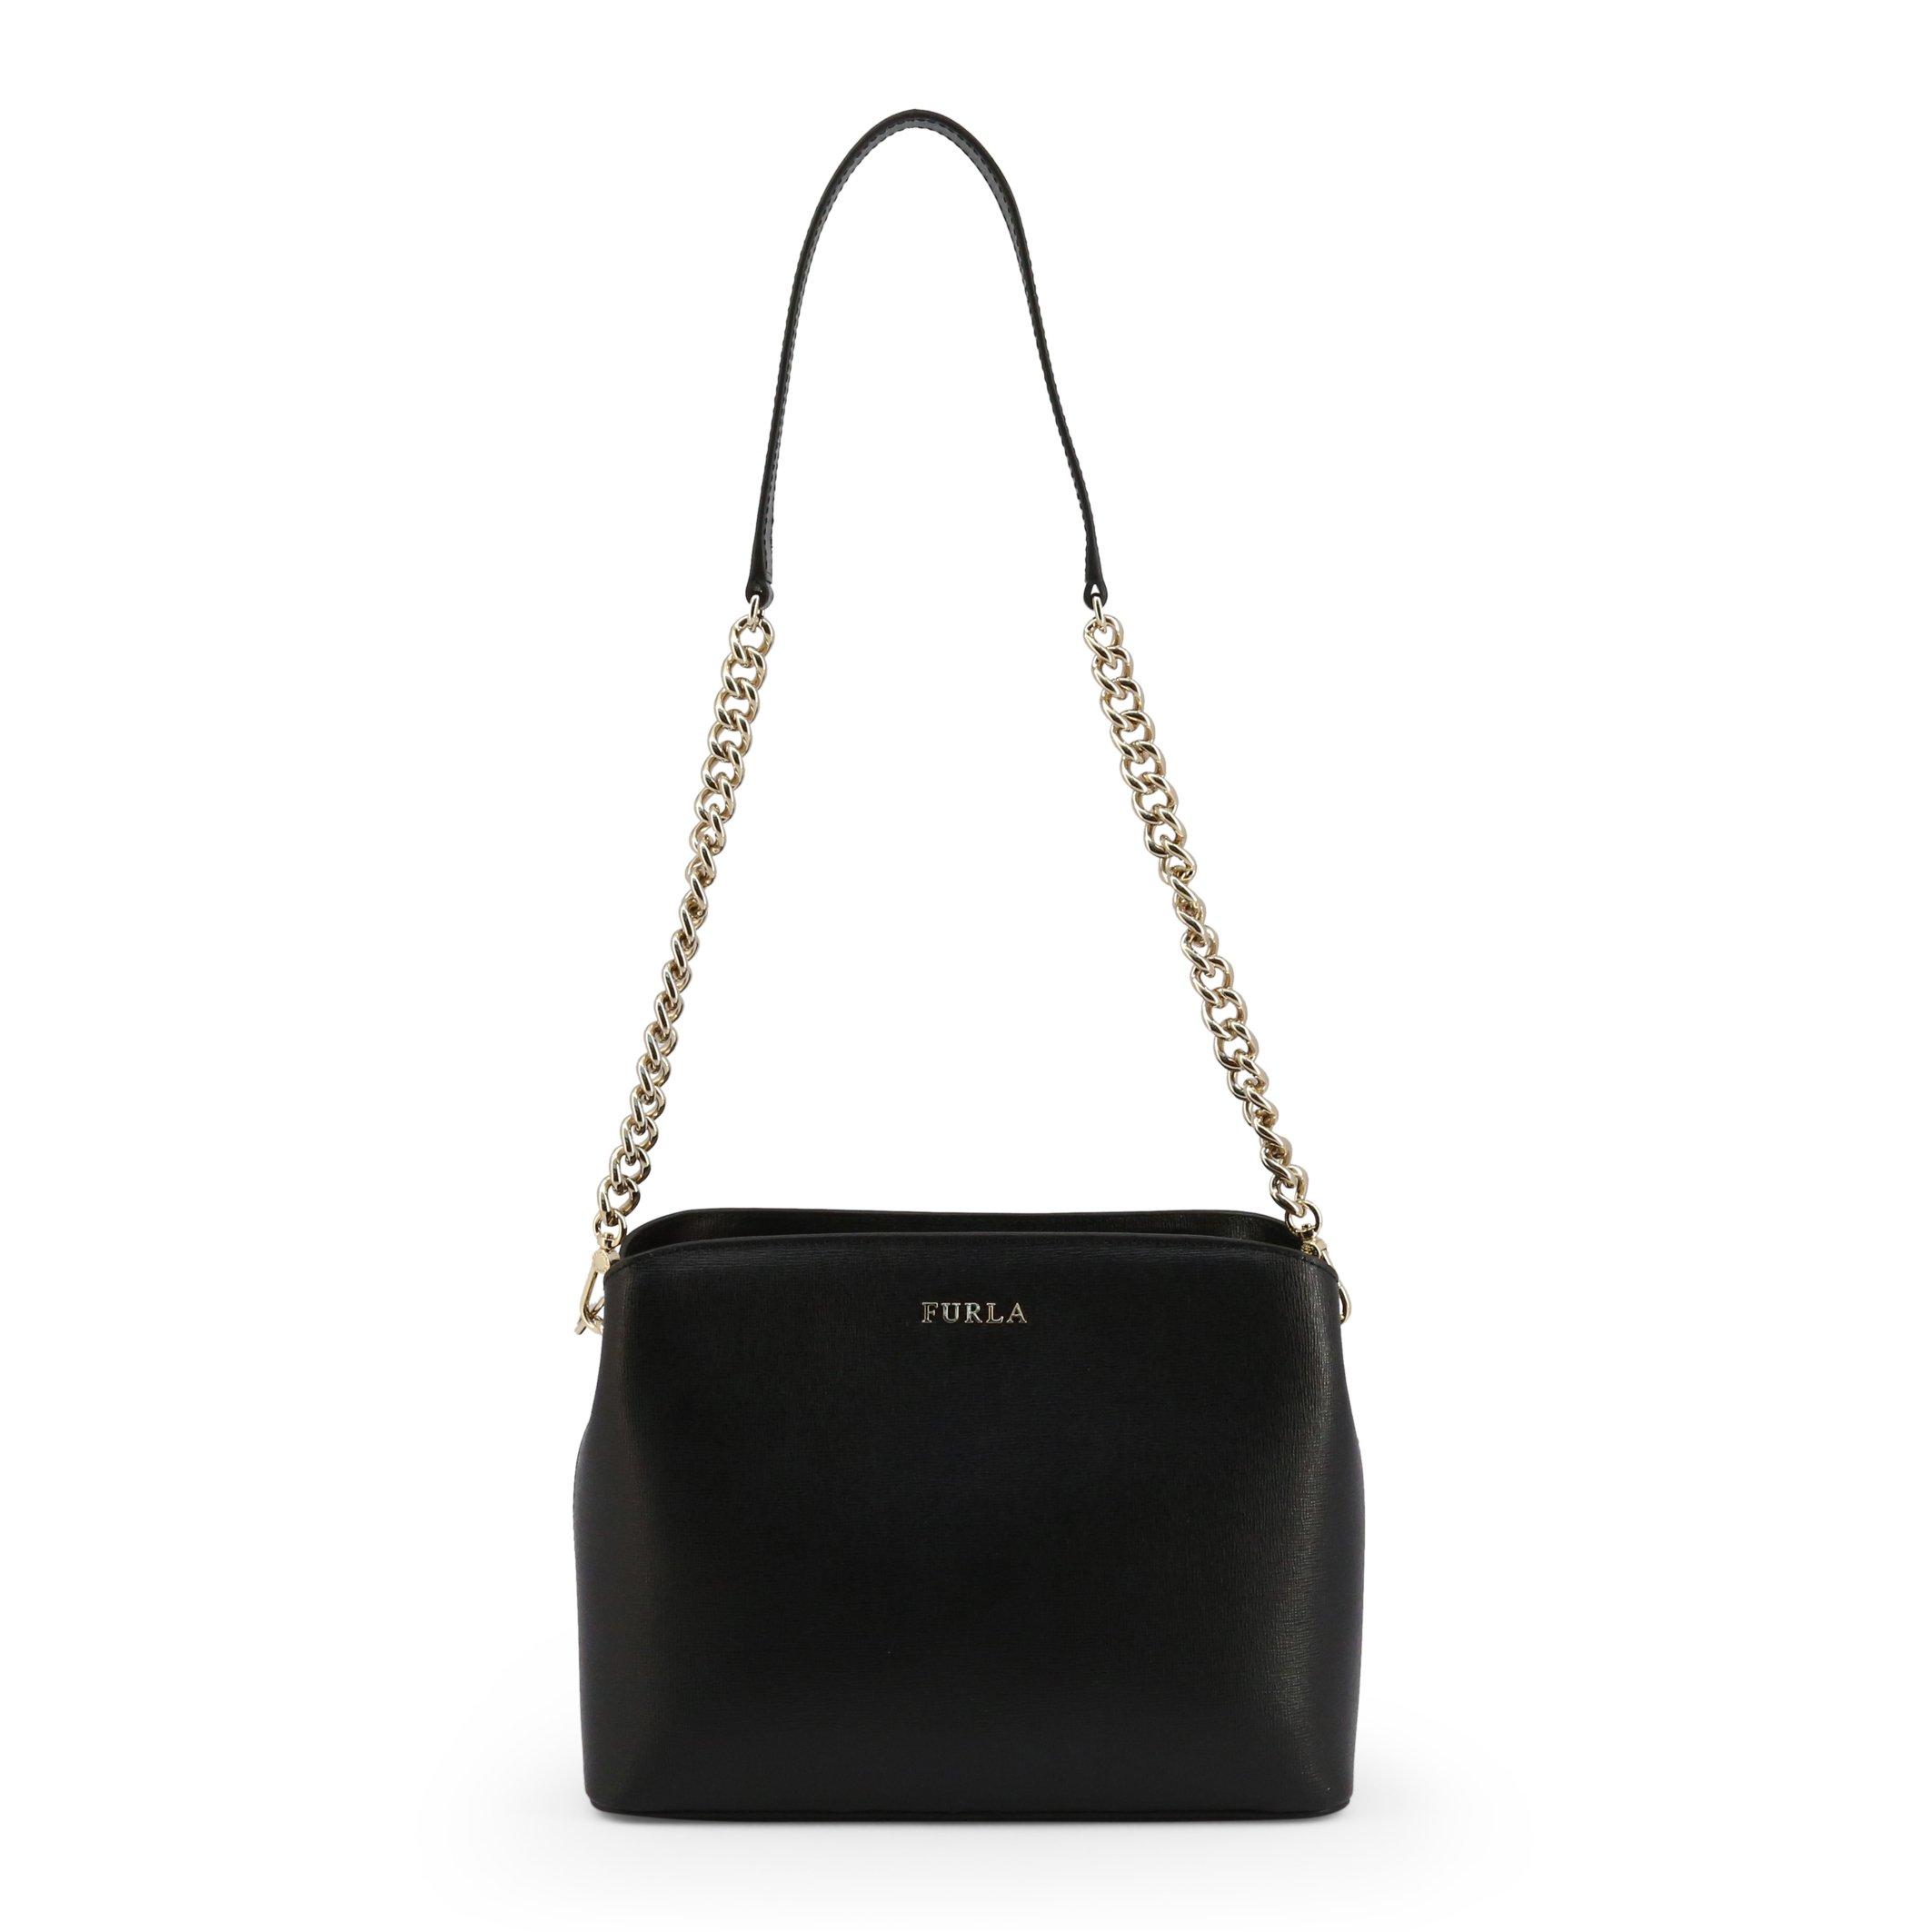 Furla Women's Shoulder Bag Various Colours TESSA_BWA9 - black NOSIZE